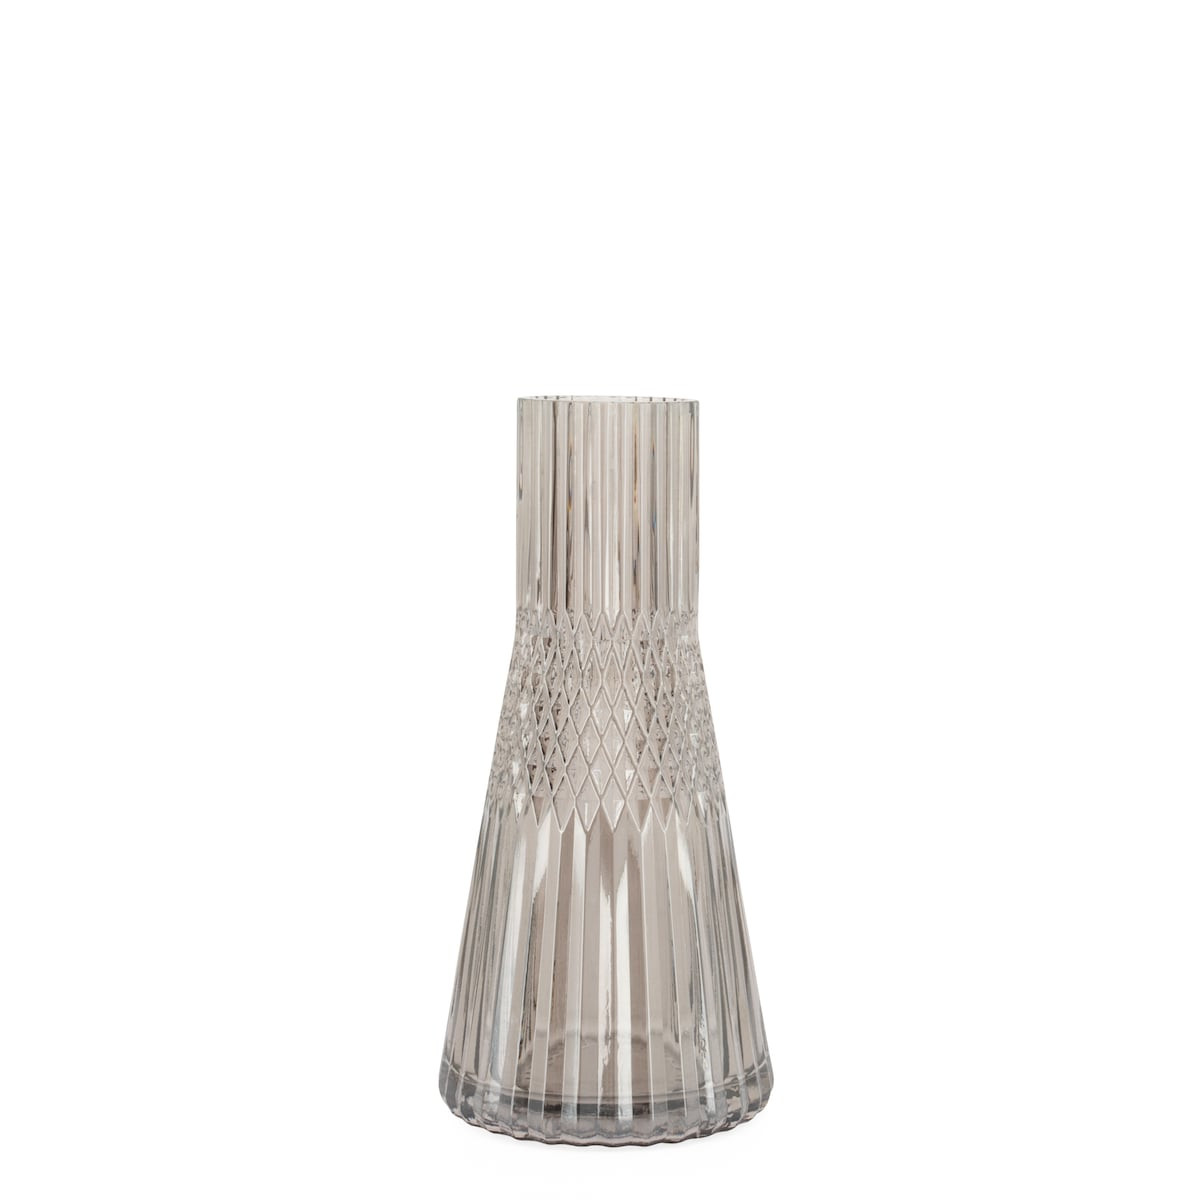 silver hammered metal vase of glass bottle at linen chest in torre tagus bottle shape vase collection